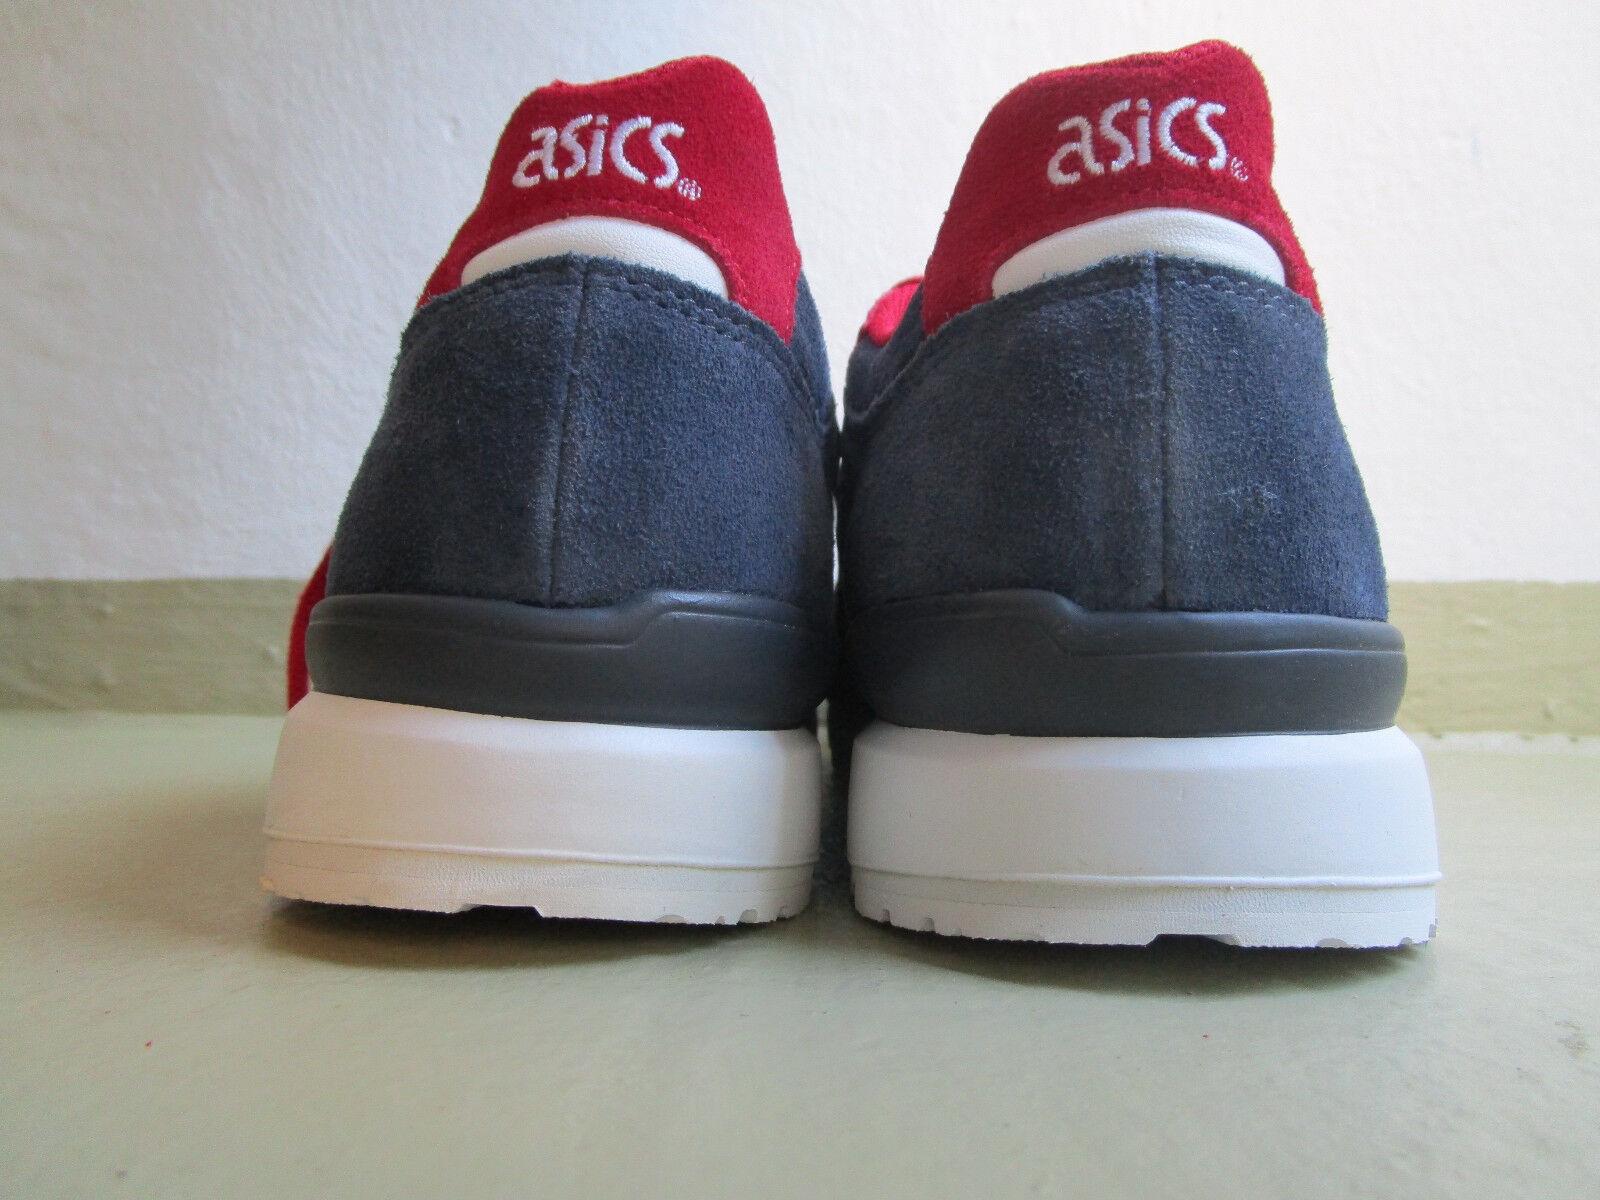 Asics Asics Asics GT-II 45